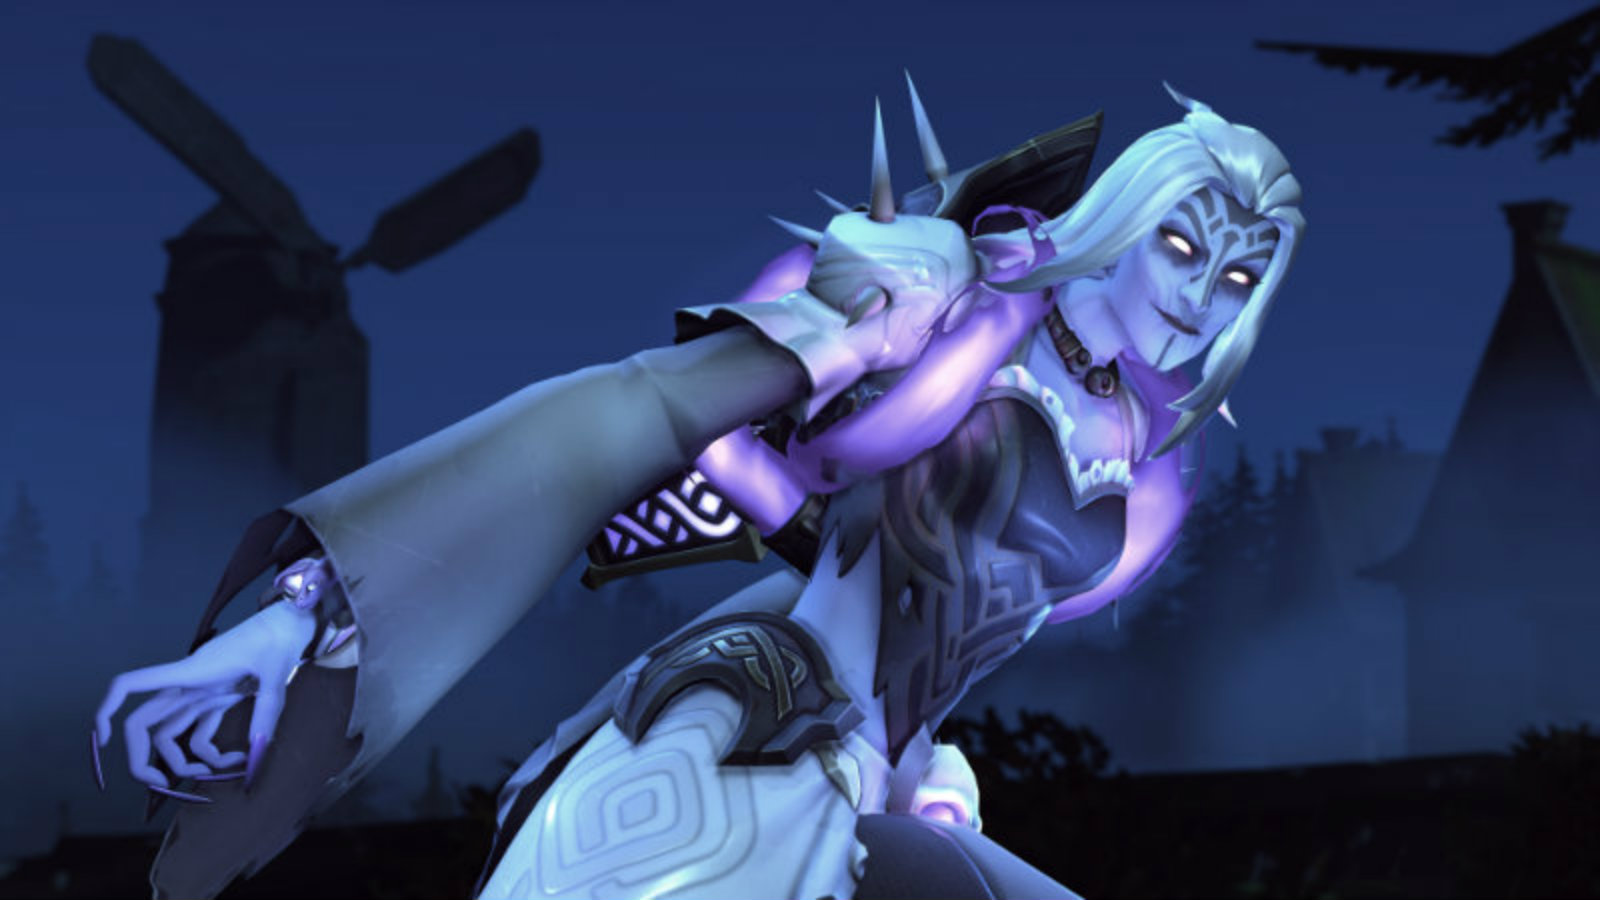 Moira's Halloween Overwatch skin